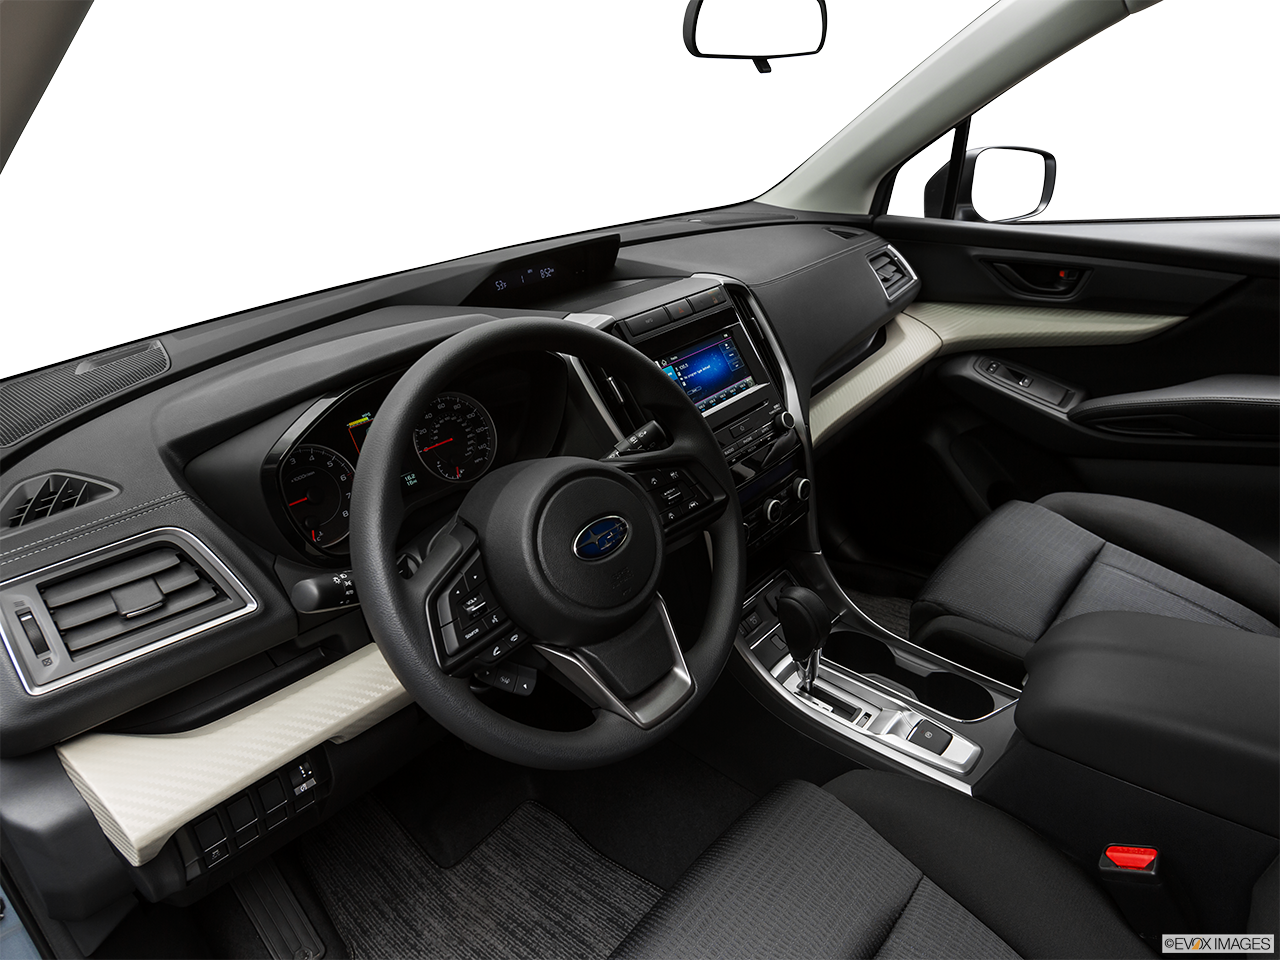 2019 Subaru Ascent photo